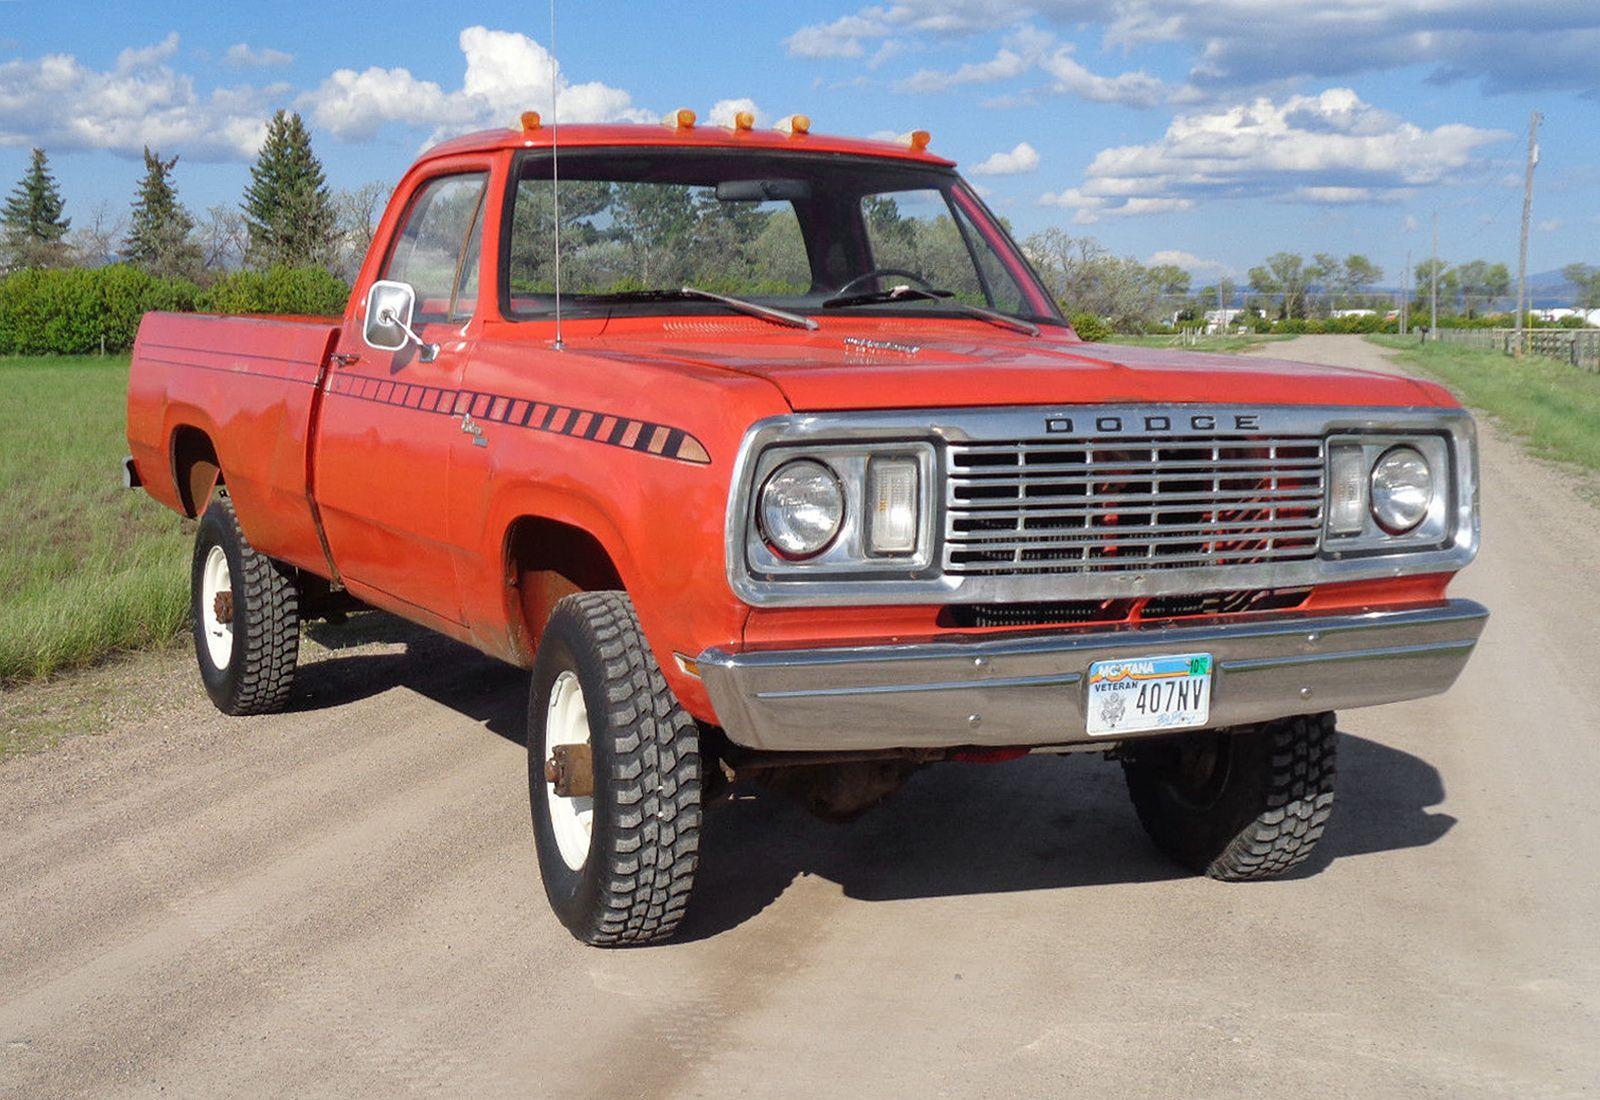 Sno-Commander: 1977 Dodge Power Wagon | Old dodge trucks ...